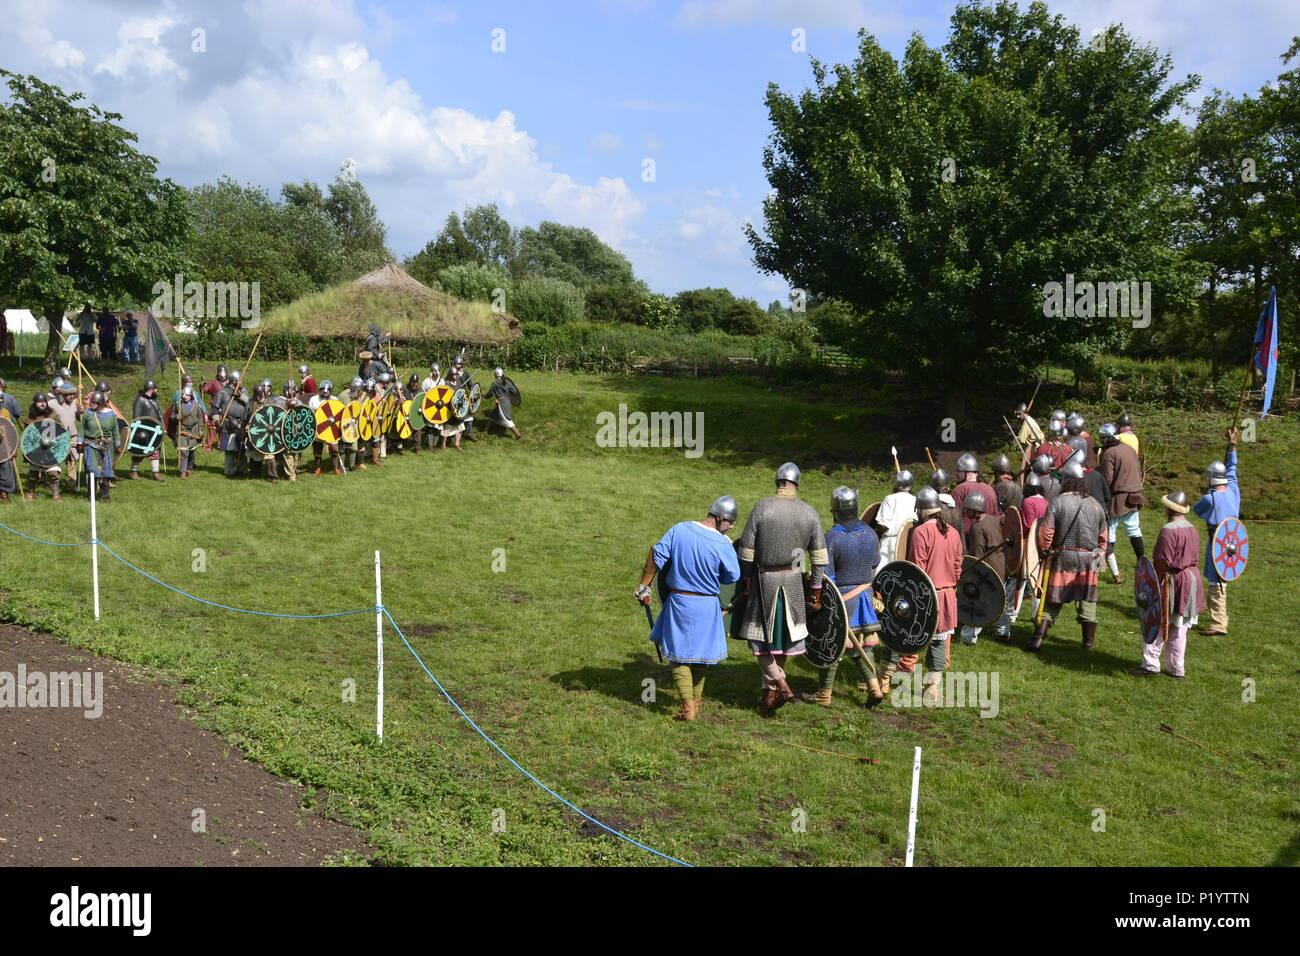 Battle at Flag Fen Archaeology Park, home of an prehistoric wooden causeway. Anglo-Saxon Re-enactment Event, Peterborough, Cambridgeshire, England, UK - Stock Image